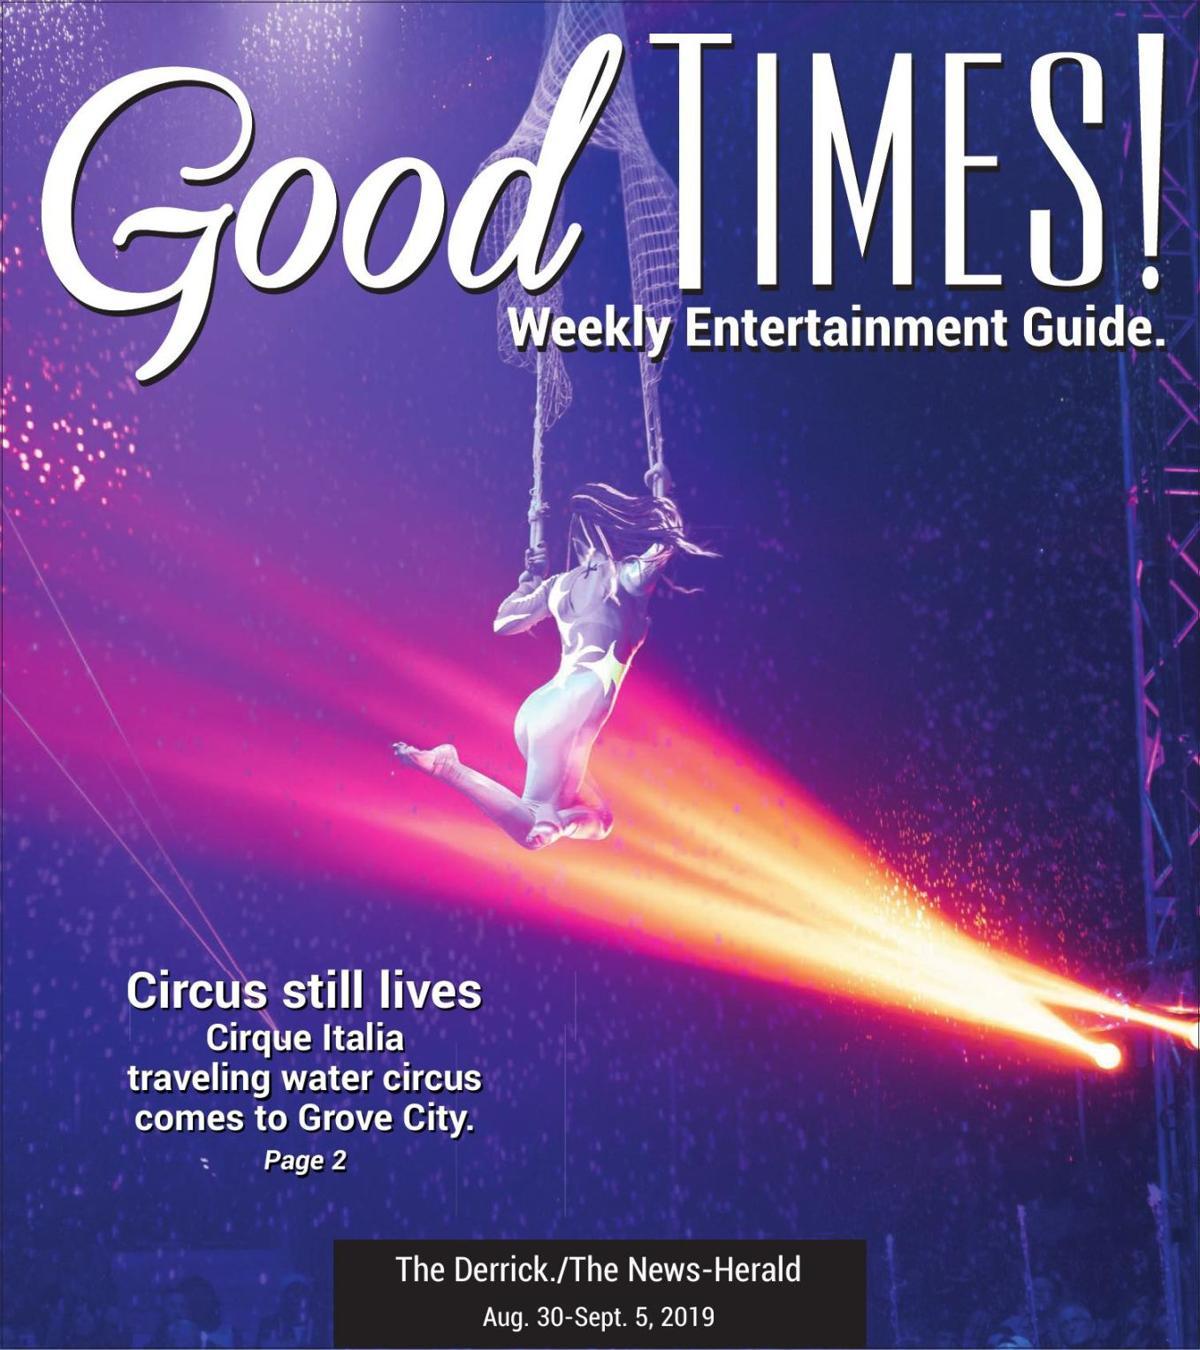 Good Times 8-30-19